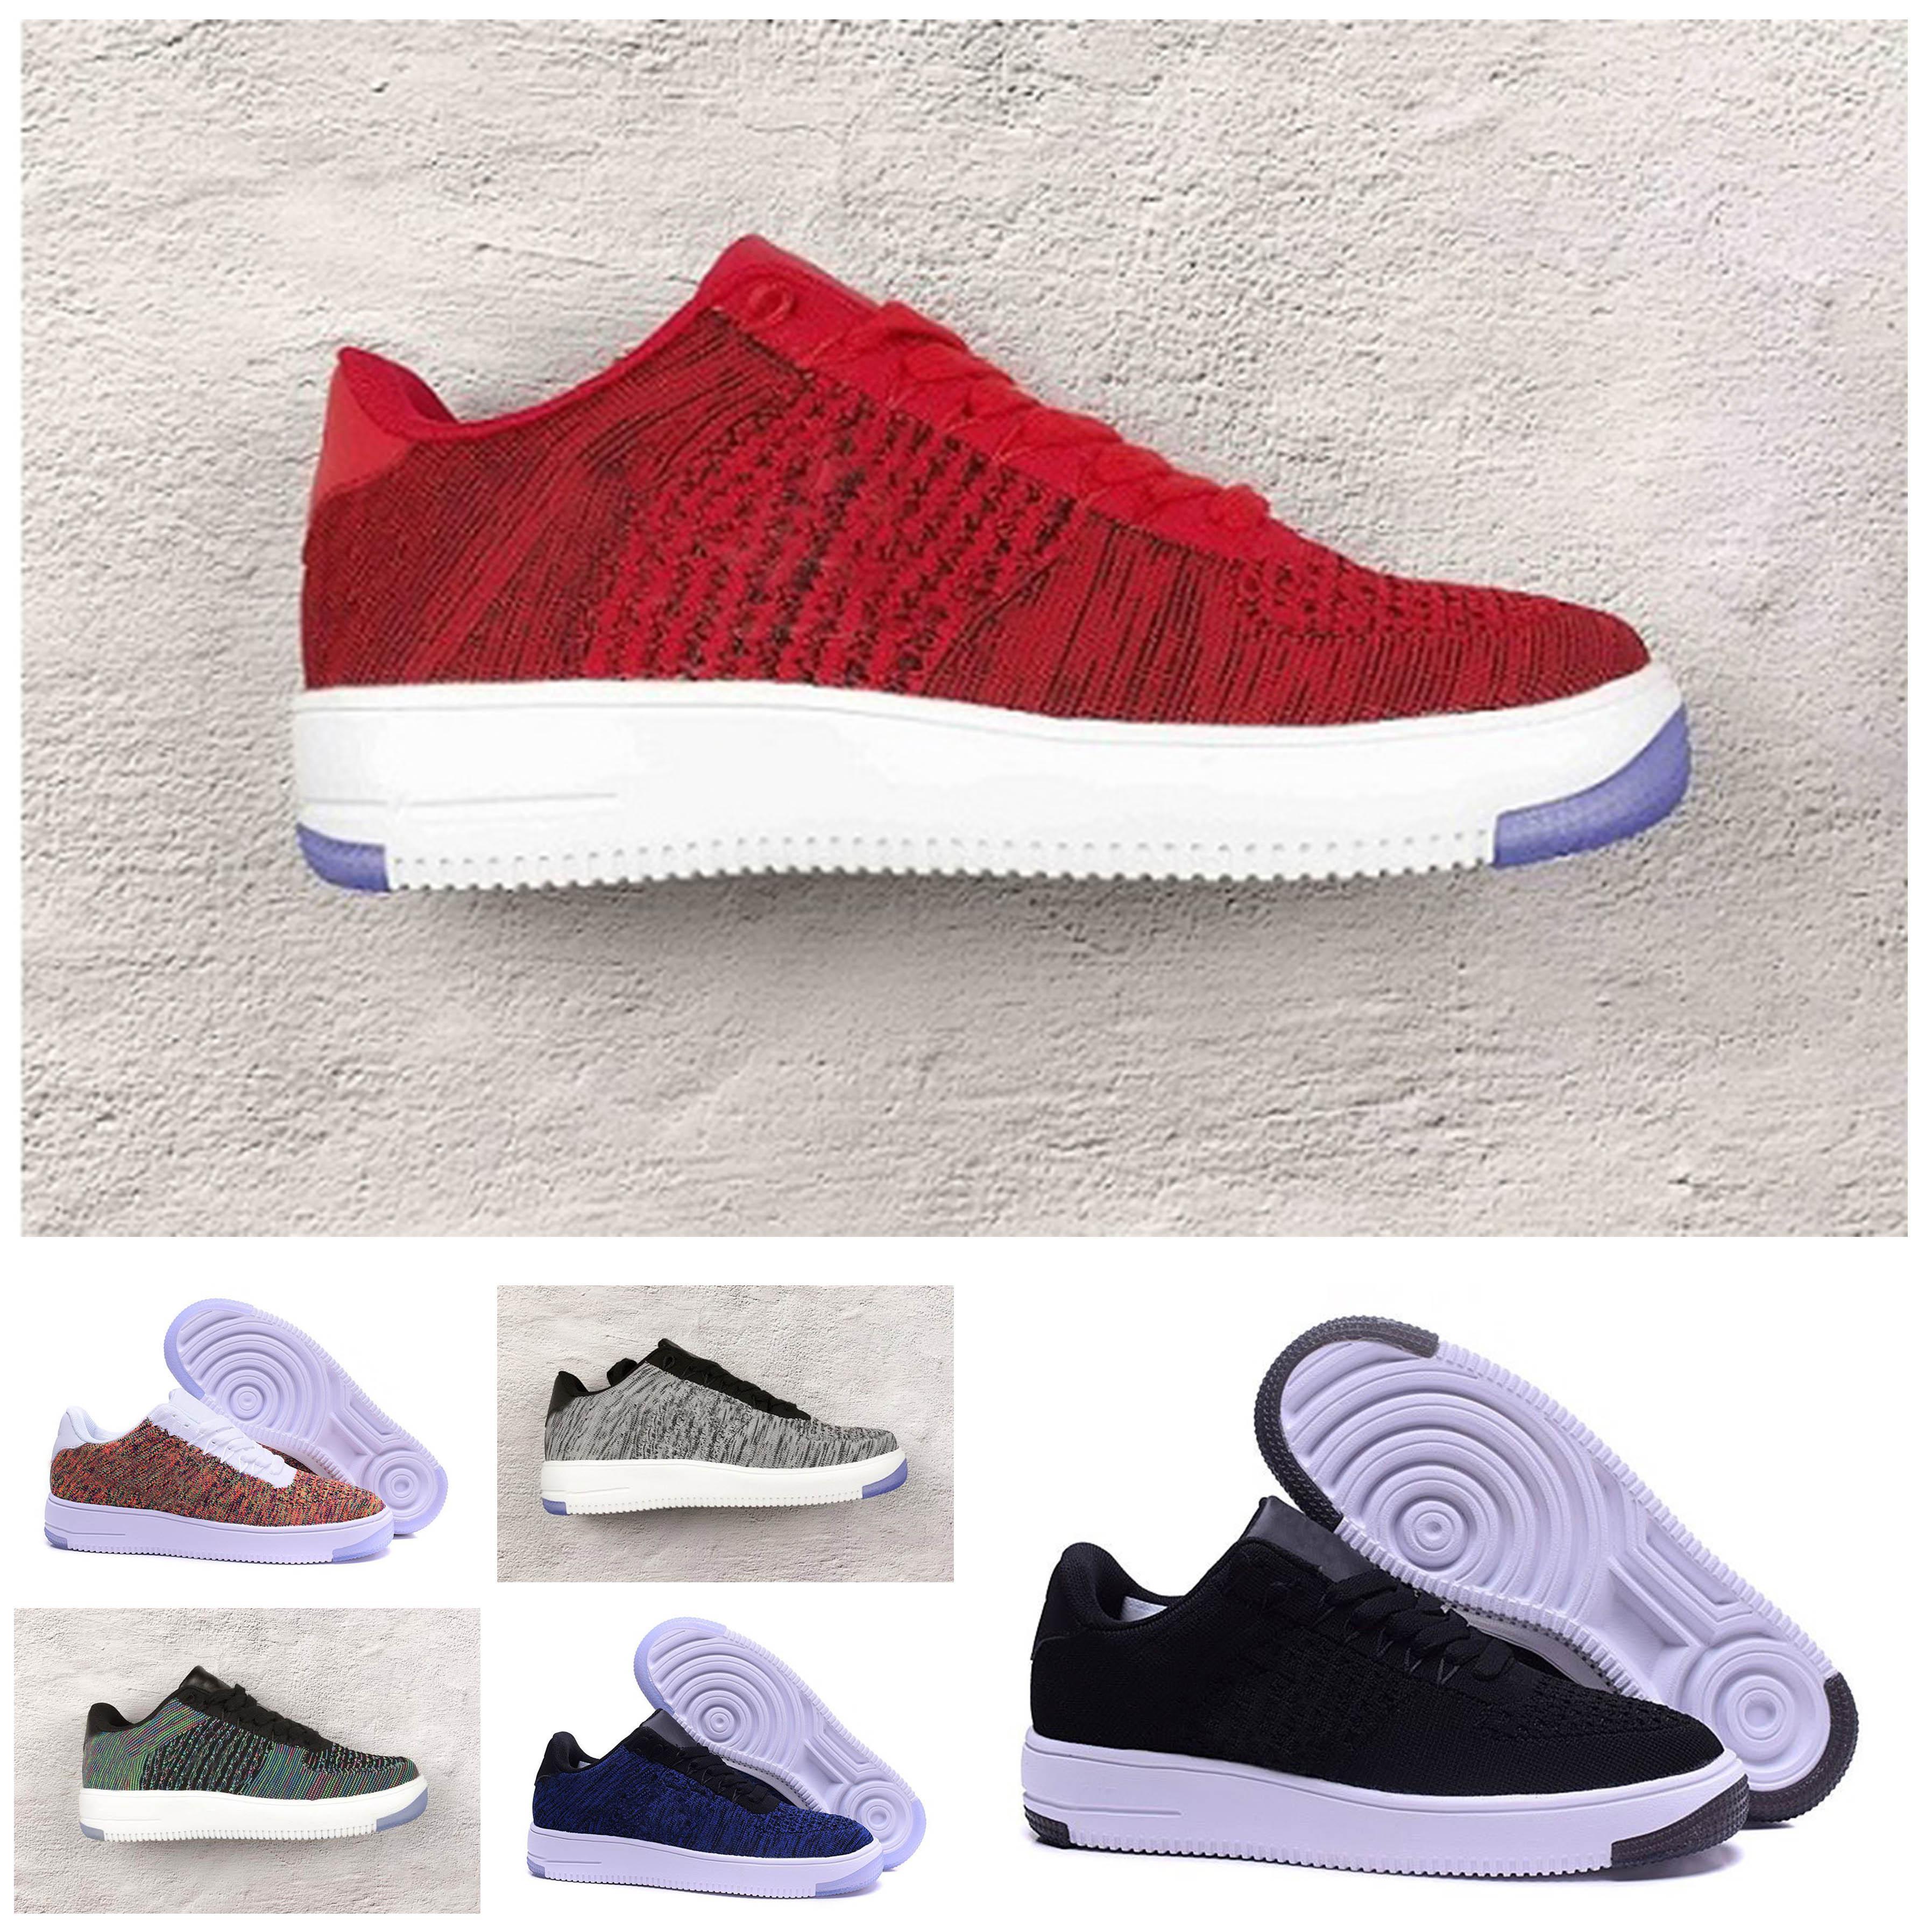 cheap for discount e5b9d 4e174 Acquista Nike Air Force One Flyknit Low Mens Running Shoes I Nuovi Uomini  Di Alta Qualità Di Moda Scarpe Da Skateboard Alto Bianco Scarpe Casual  Maglia Nera ...